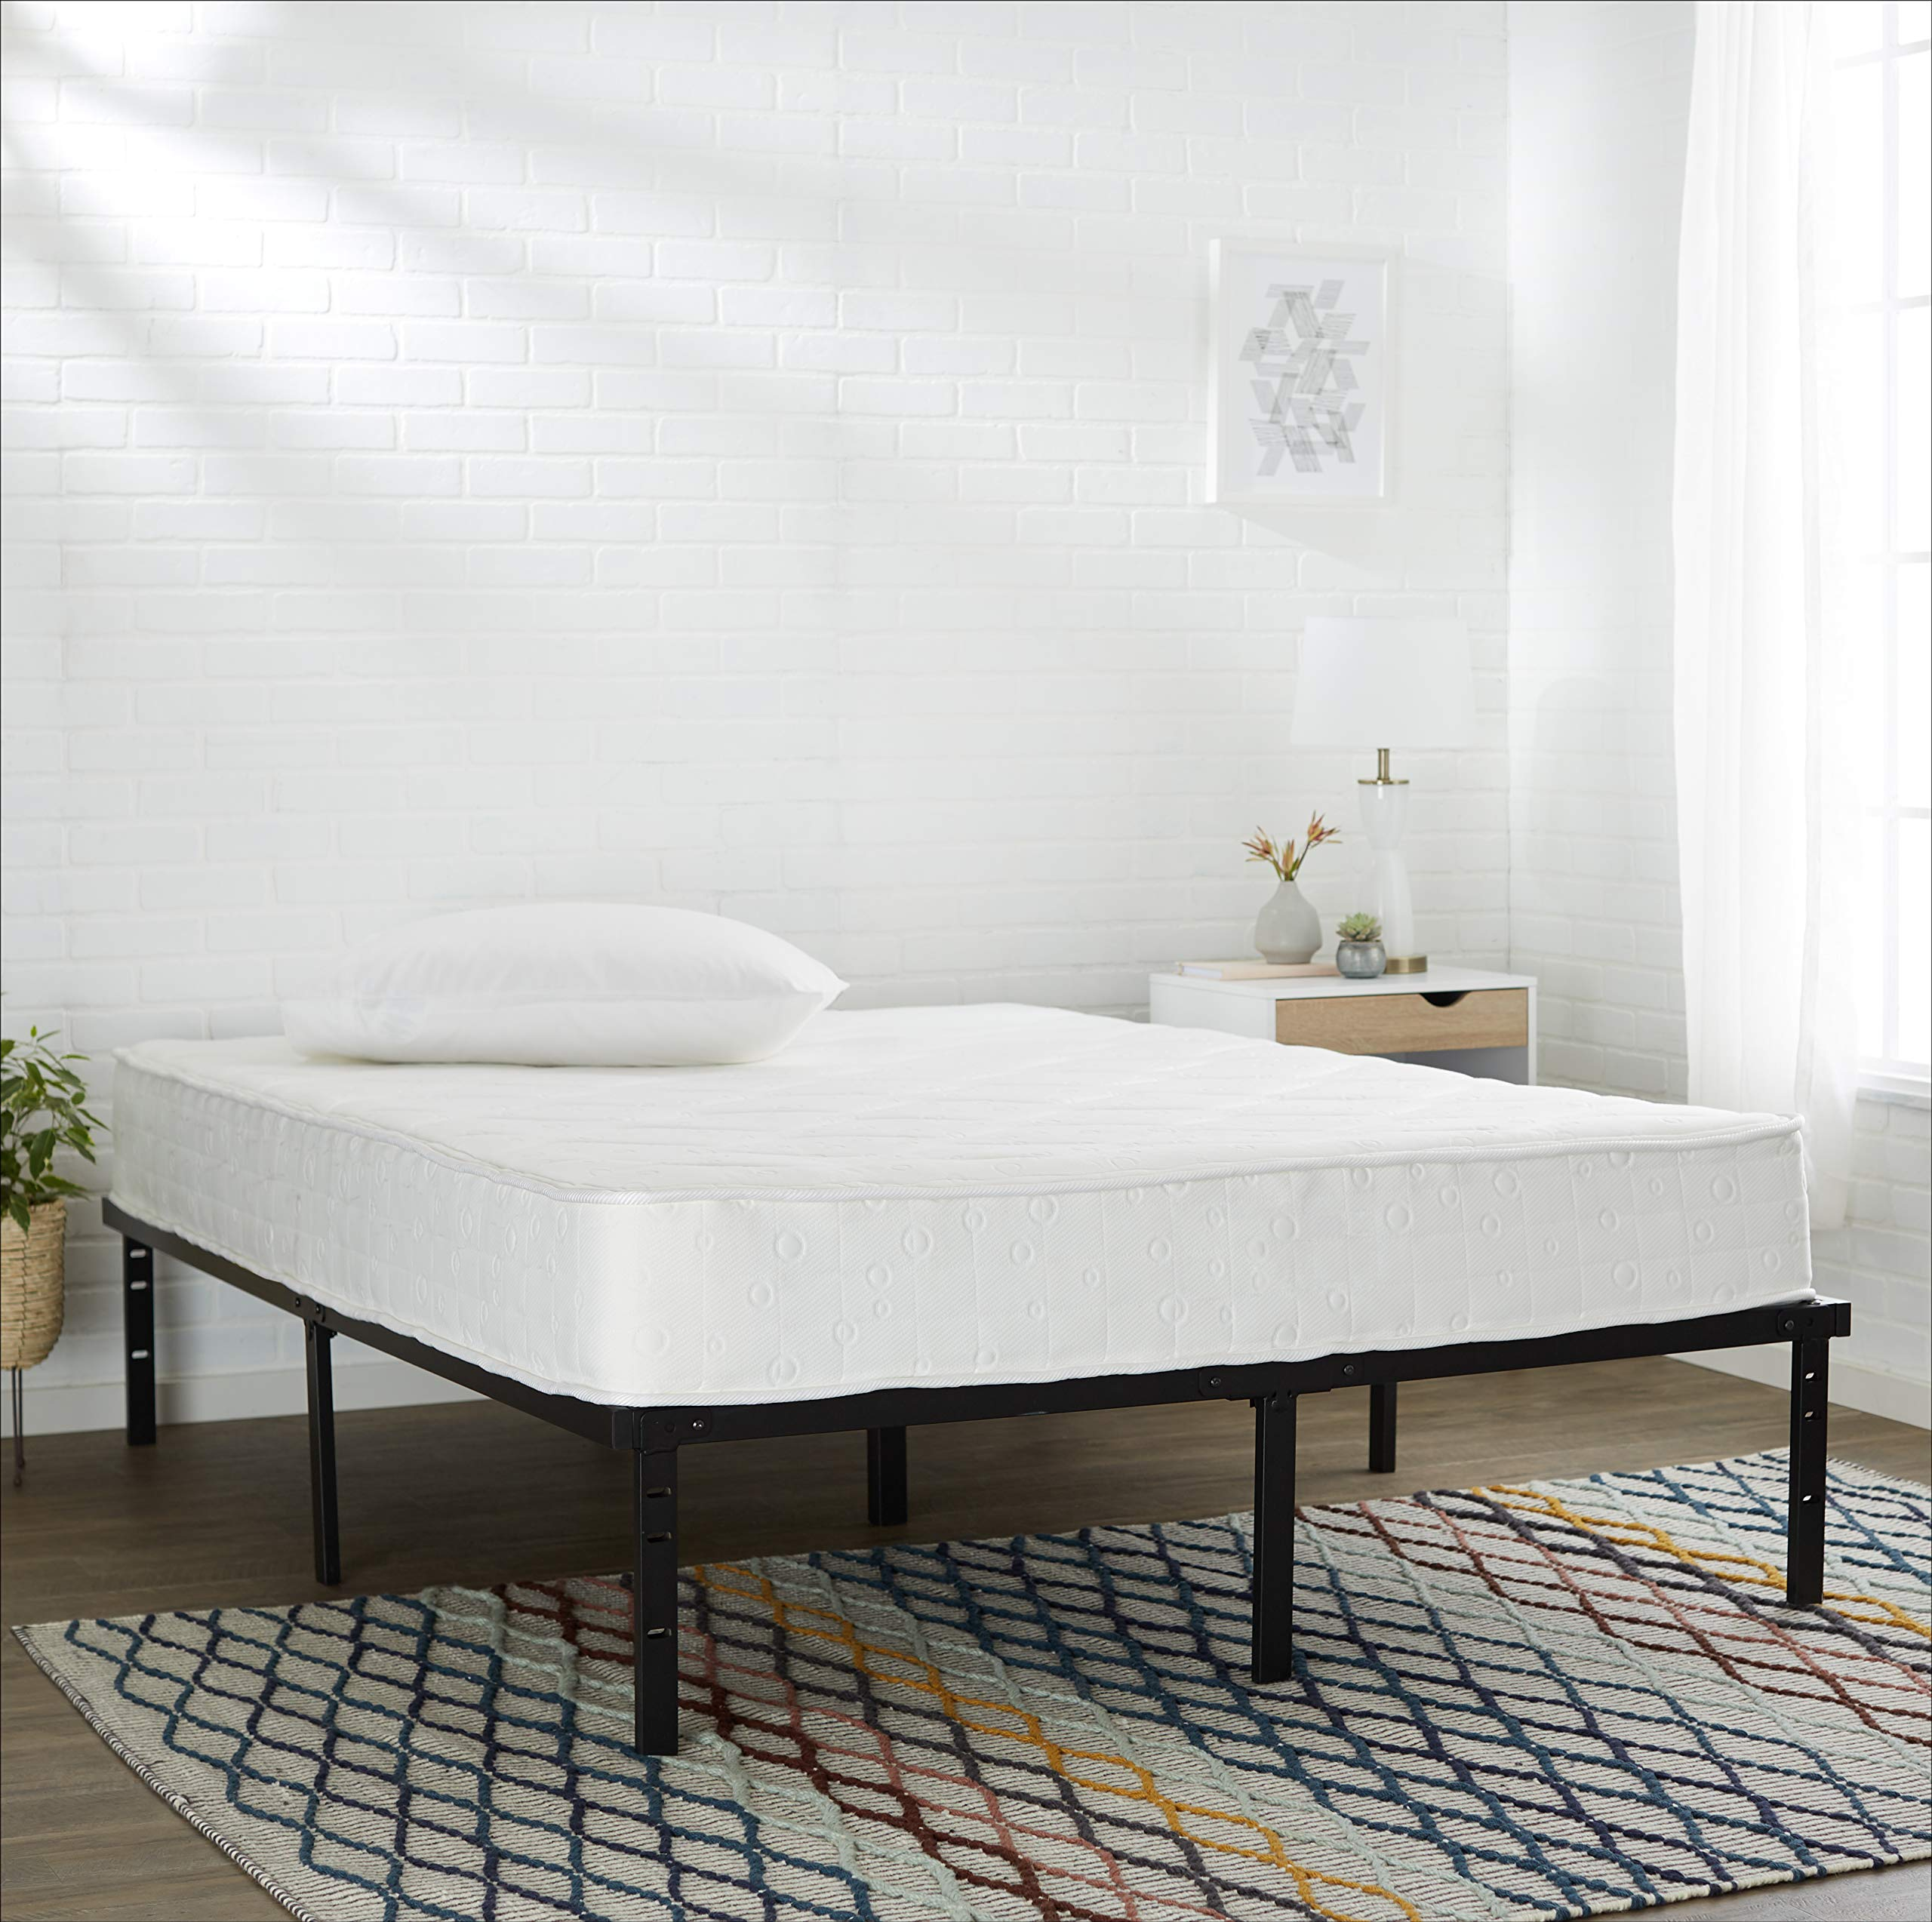 AmazonBasics Heavy Duty Non-Slip Bed Frame with Steel Slats, Tools-free Assembly - 14-Inch, Queen by AmazonBasics